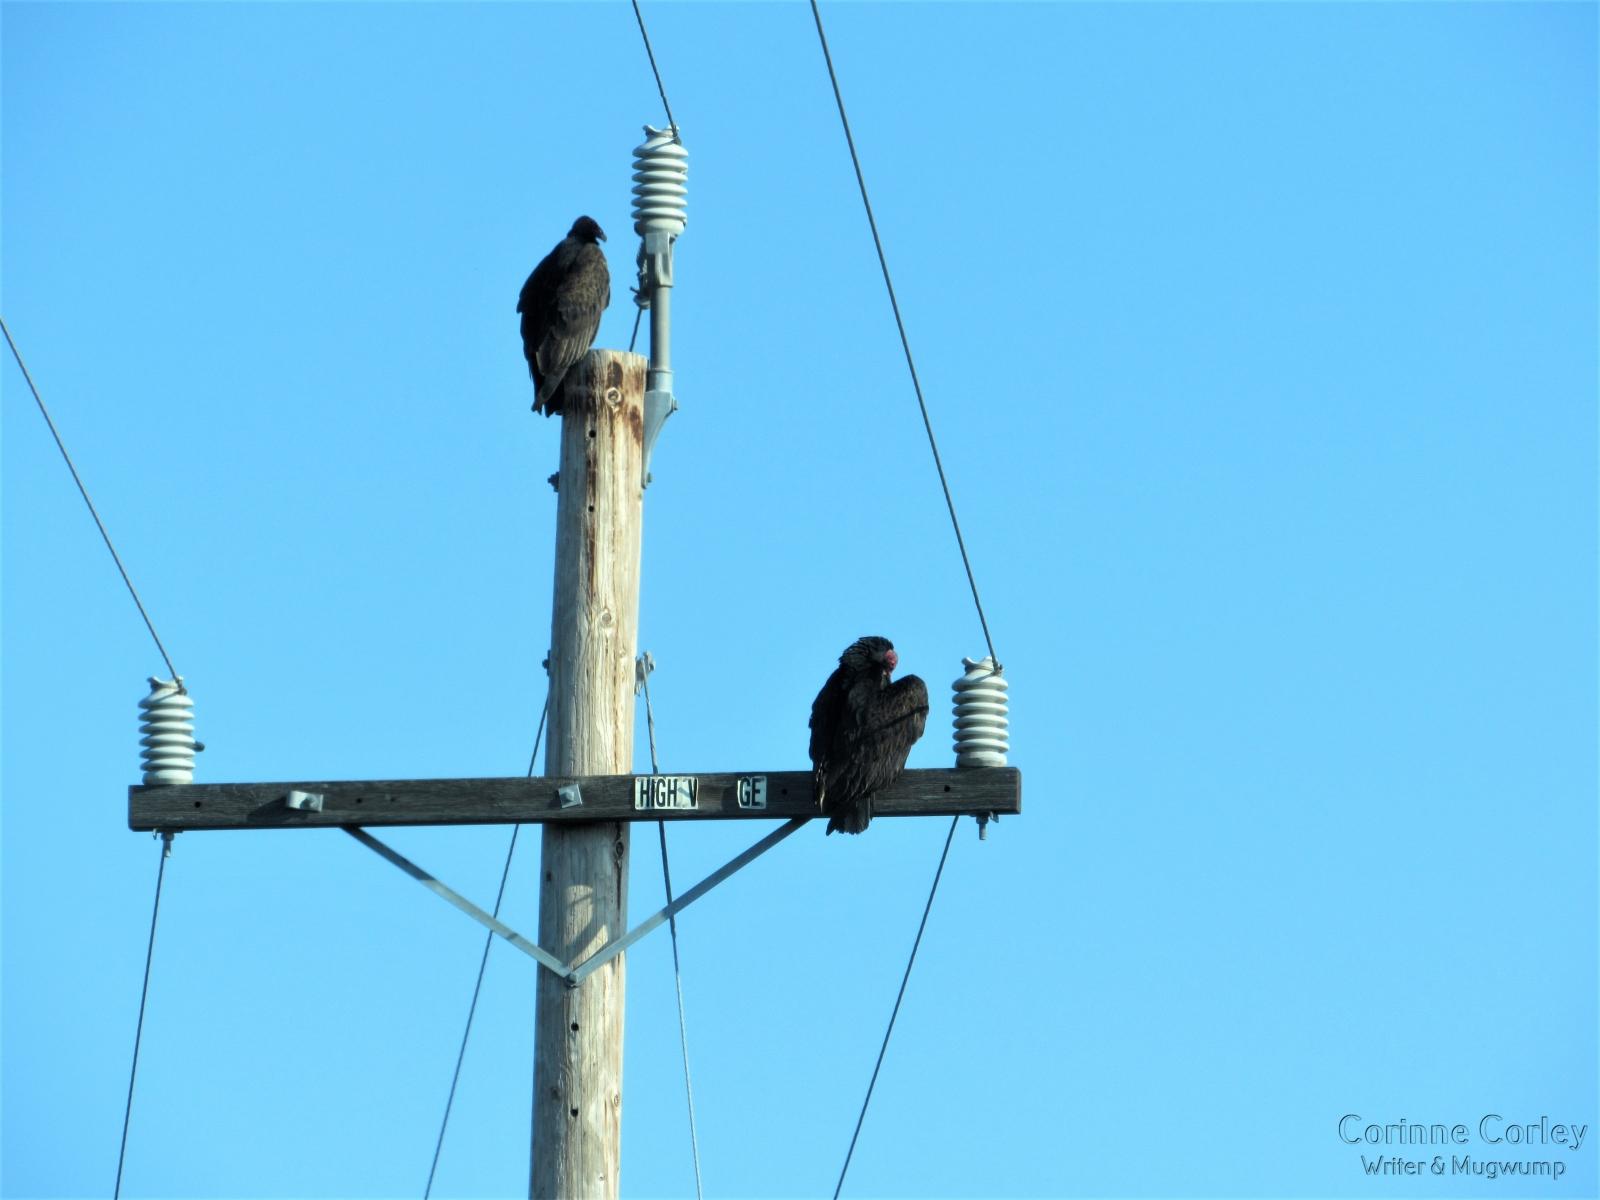 Morning-watchers